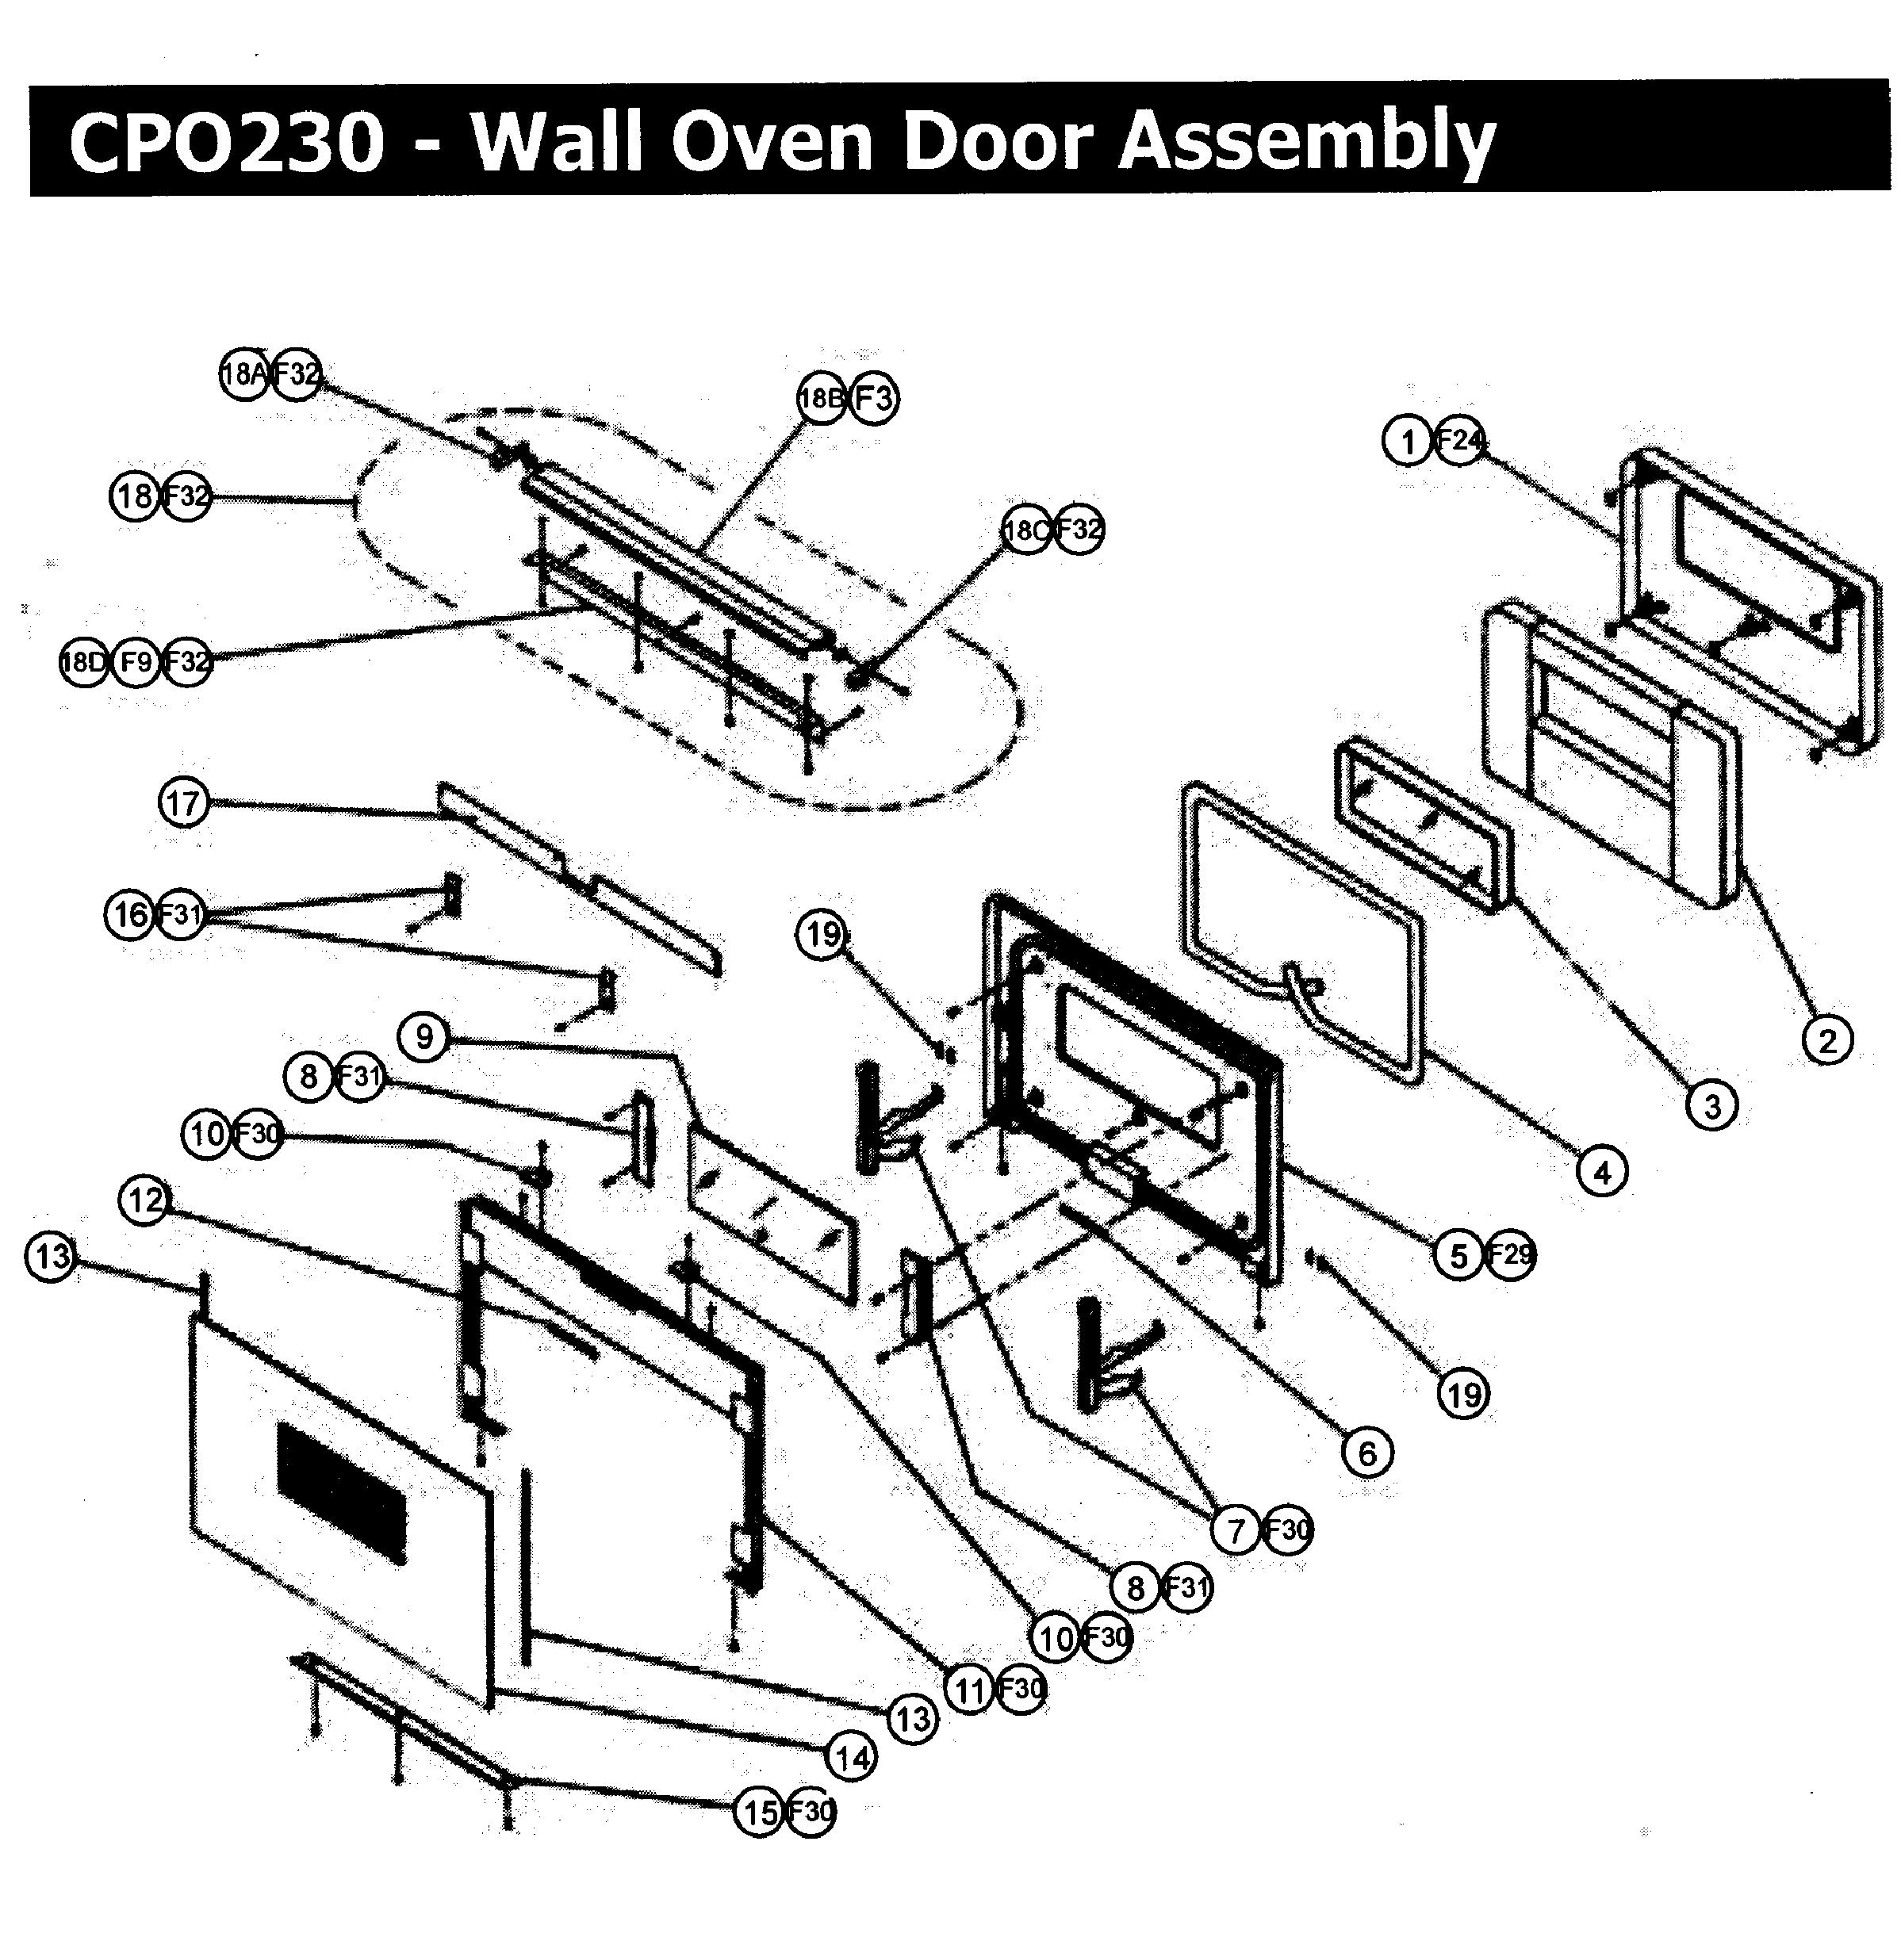 CPO230 Wall Oven Door assy Parts diagram